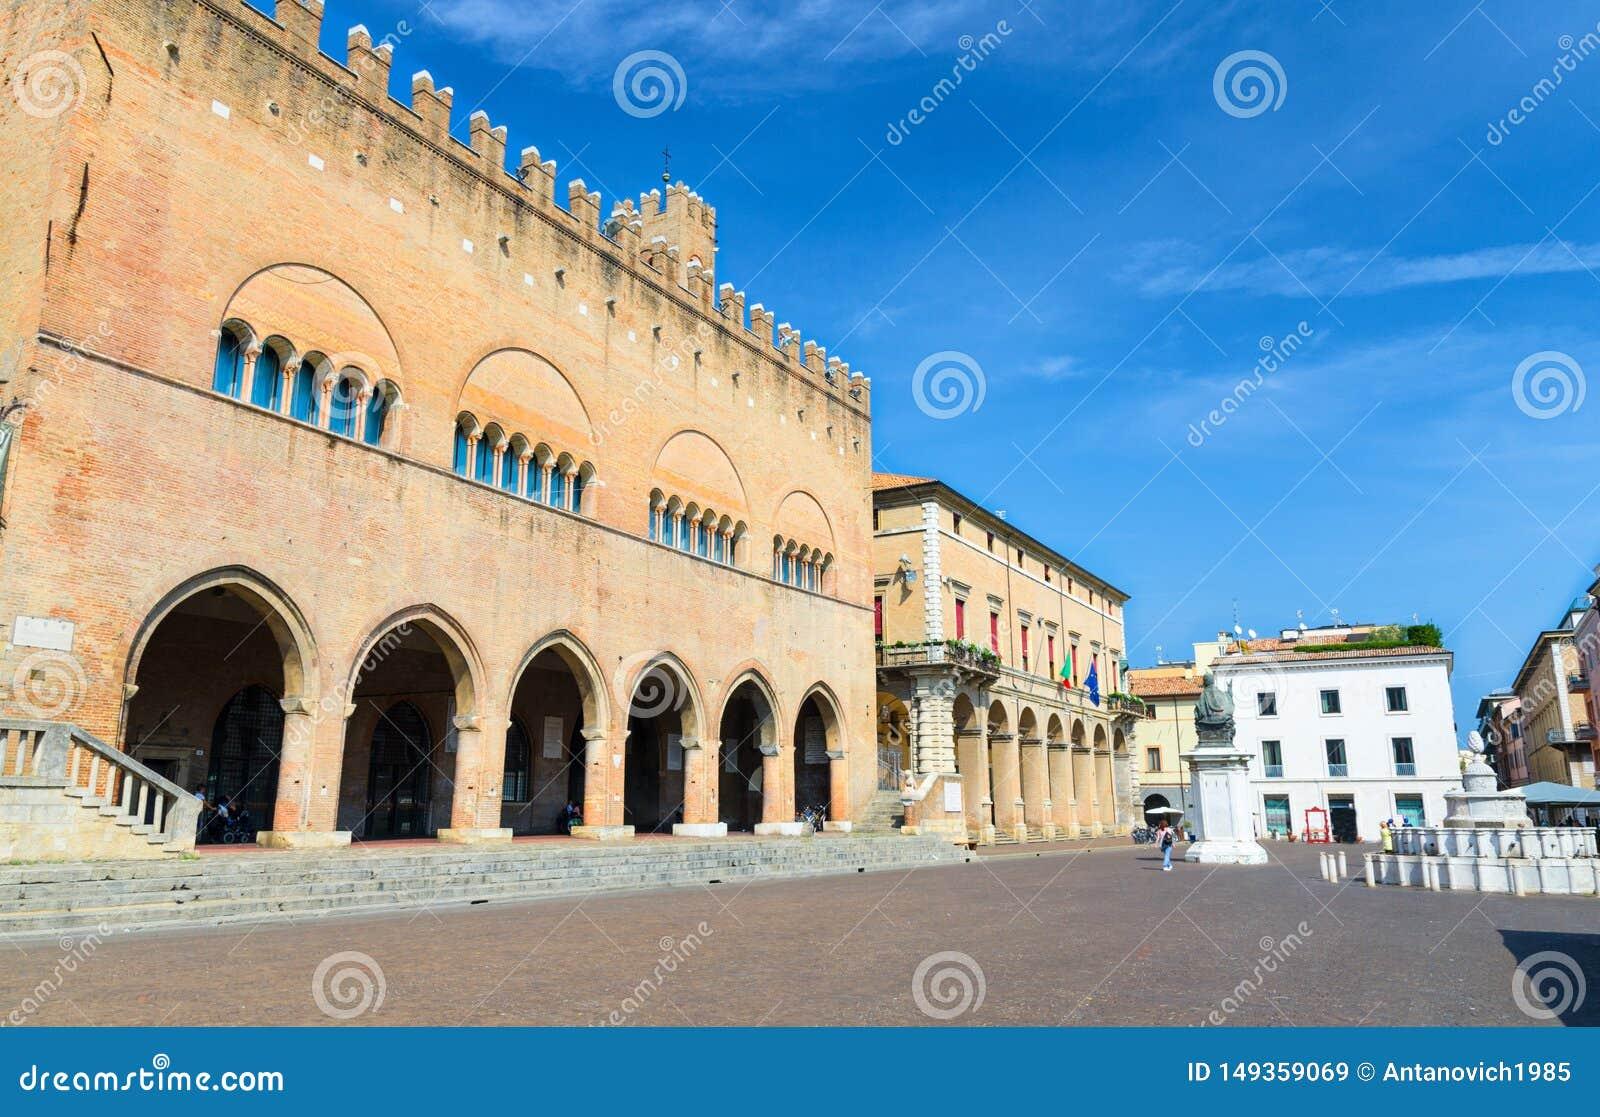 Palazzo小山谷'Arengo与曲拱的宫殿大厦和在广场卡武尔广场的保禄五世雕象在里米尼